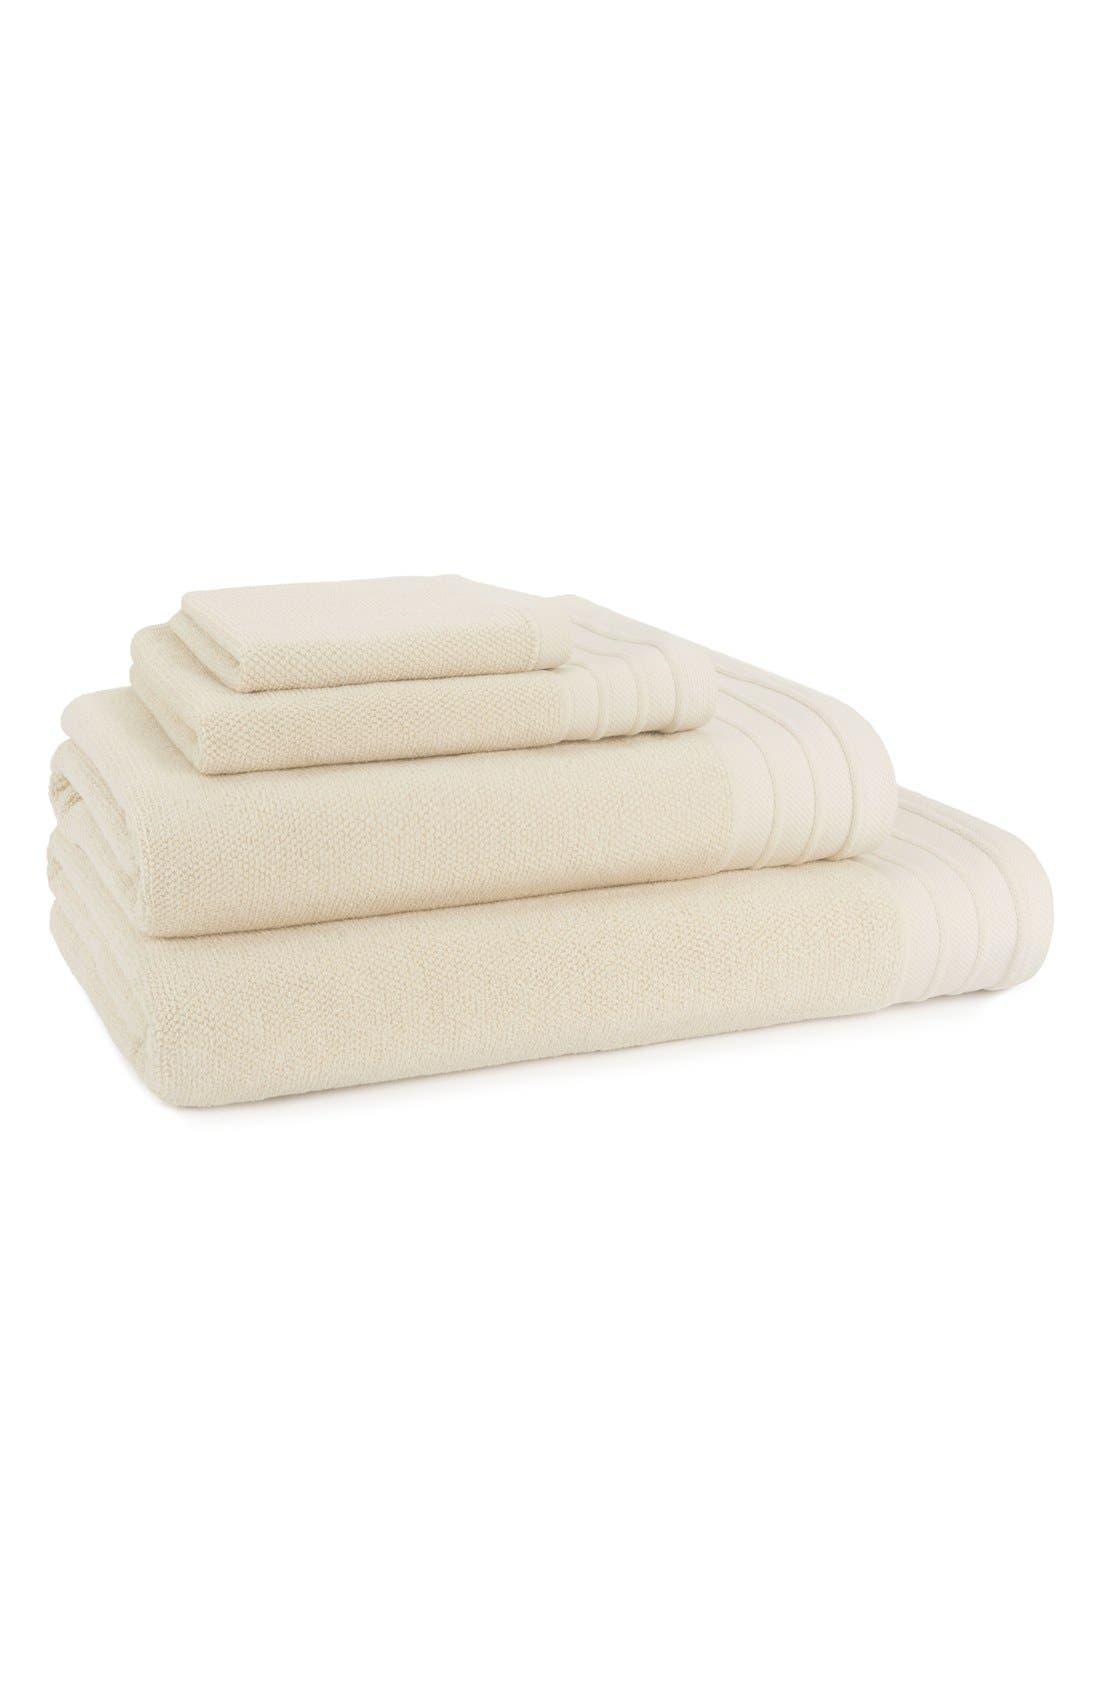 Alternate Image 2  - UGG® Classic Luxe Cotton Bath Sheet